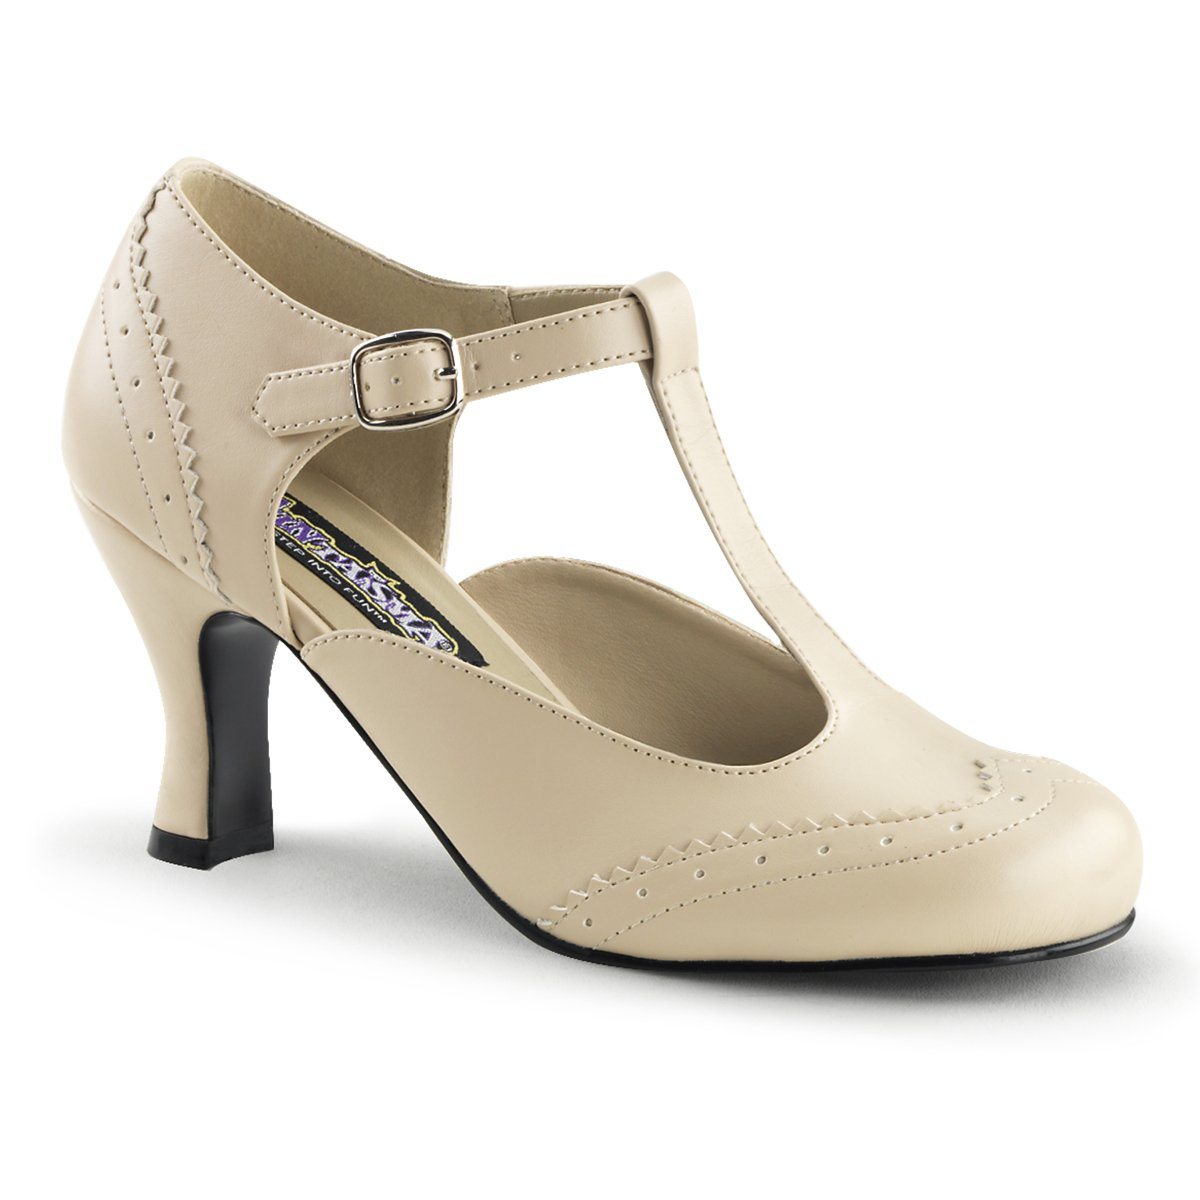 Funtasma FLAPPER-26 womens Pumps Shoes PLE-FLAPPER-26-SDS